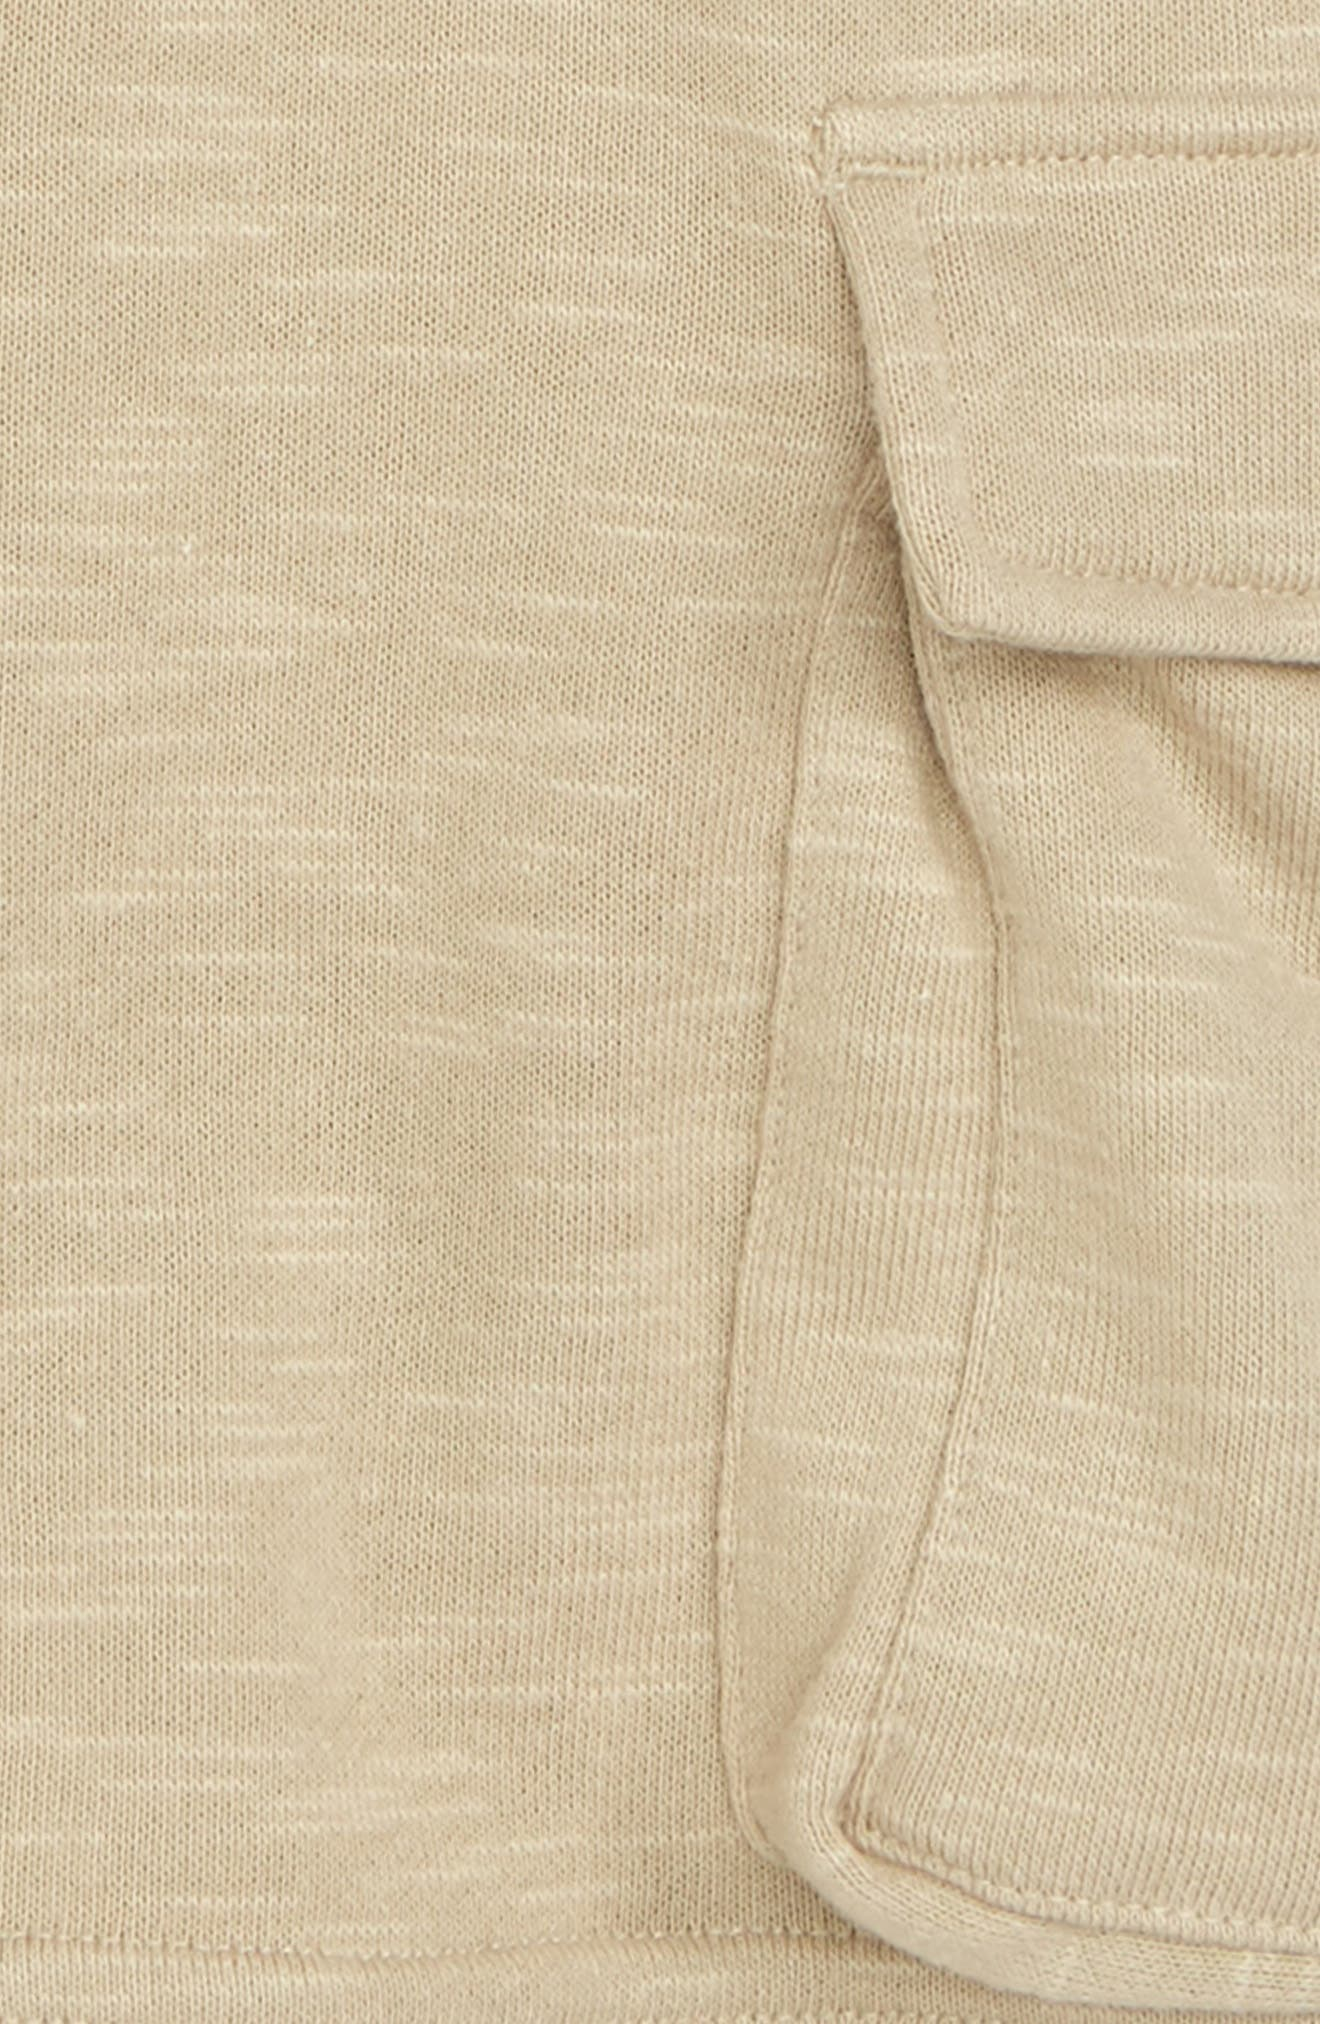 Cargo Shorts,                             Alternate thumbnail 2, color,                             SAND